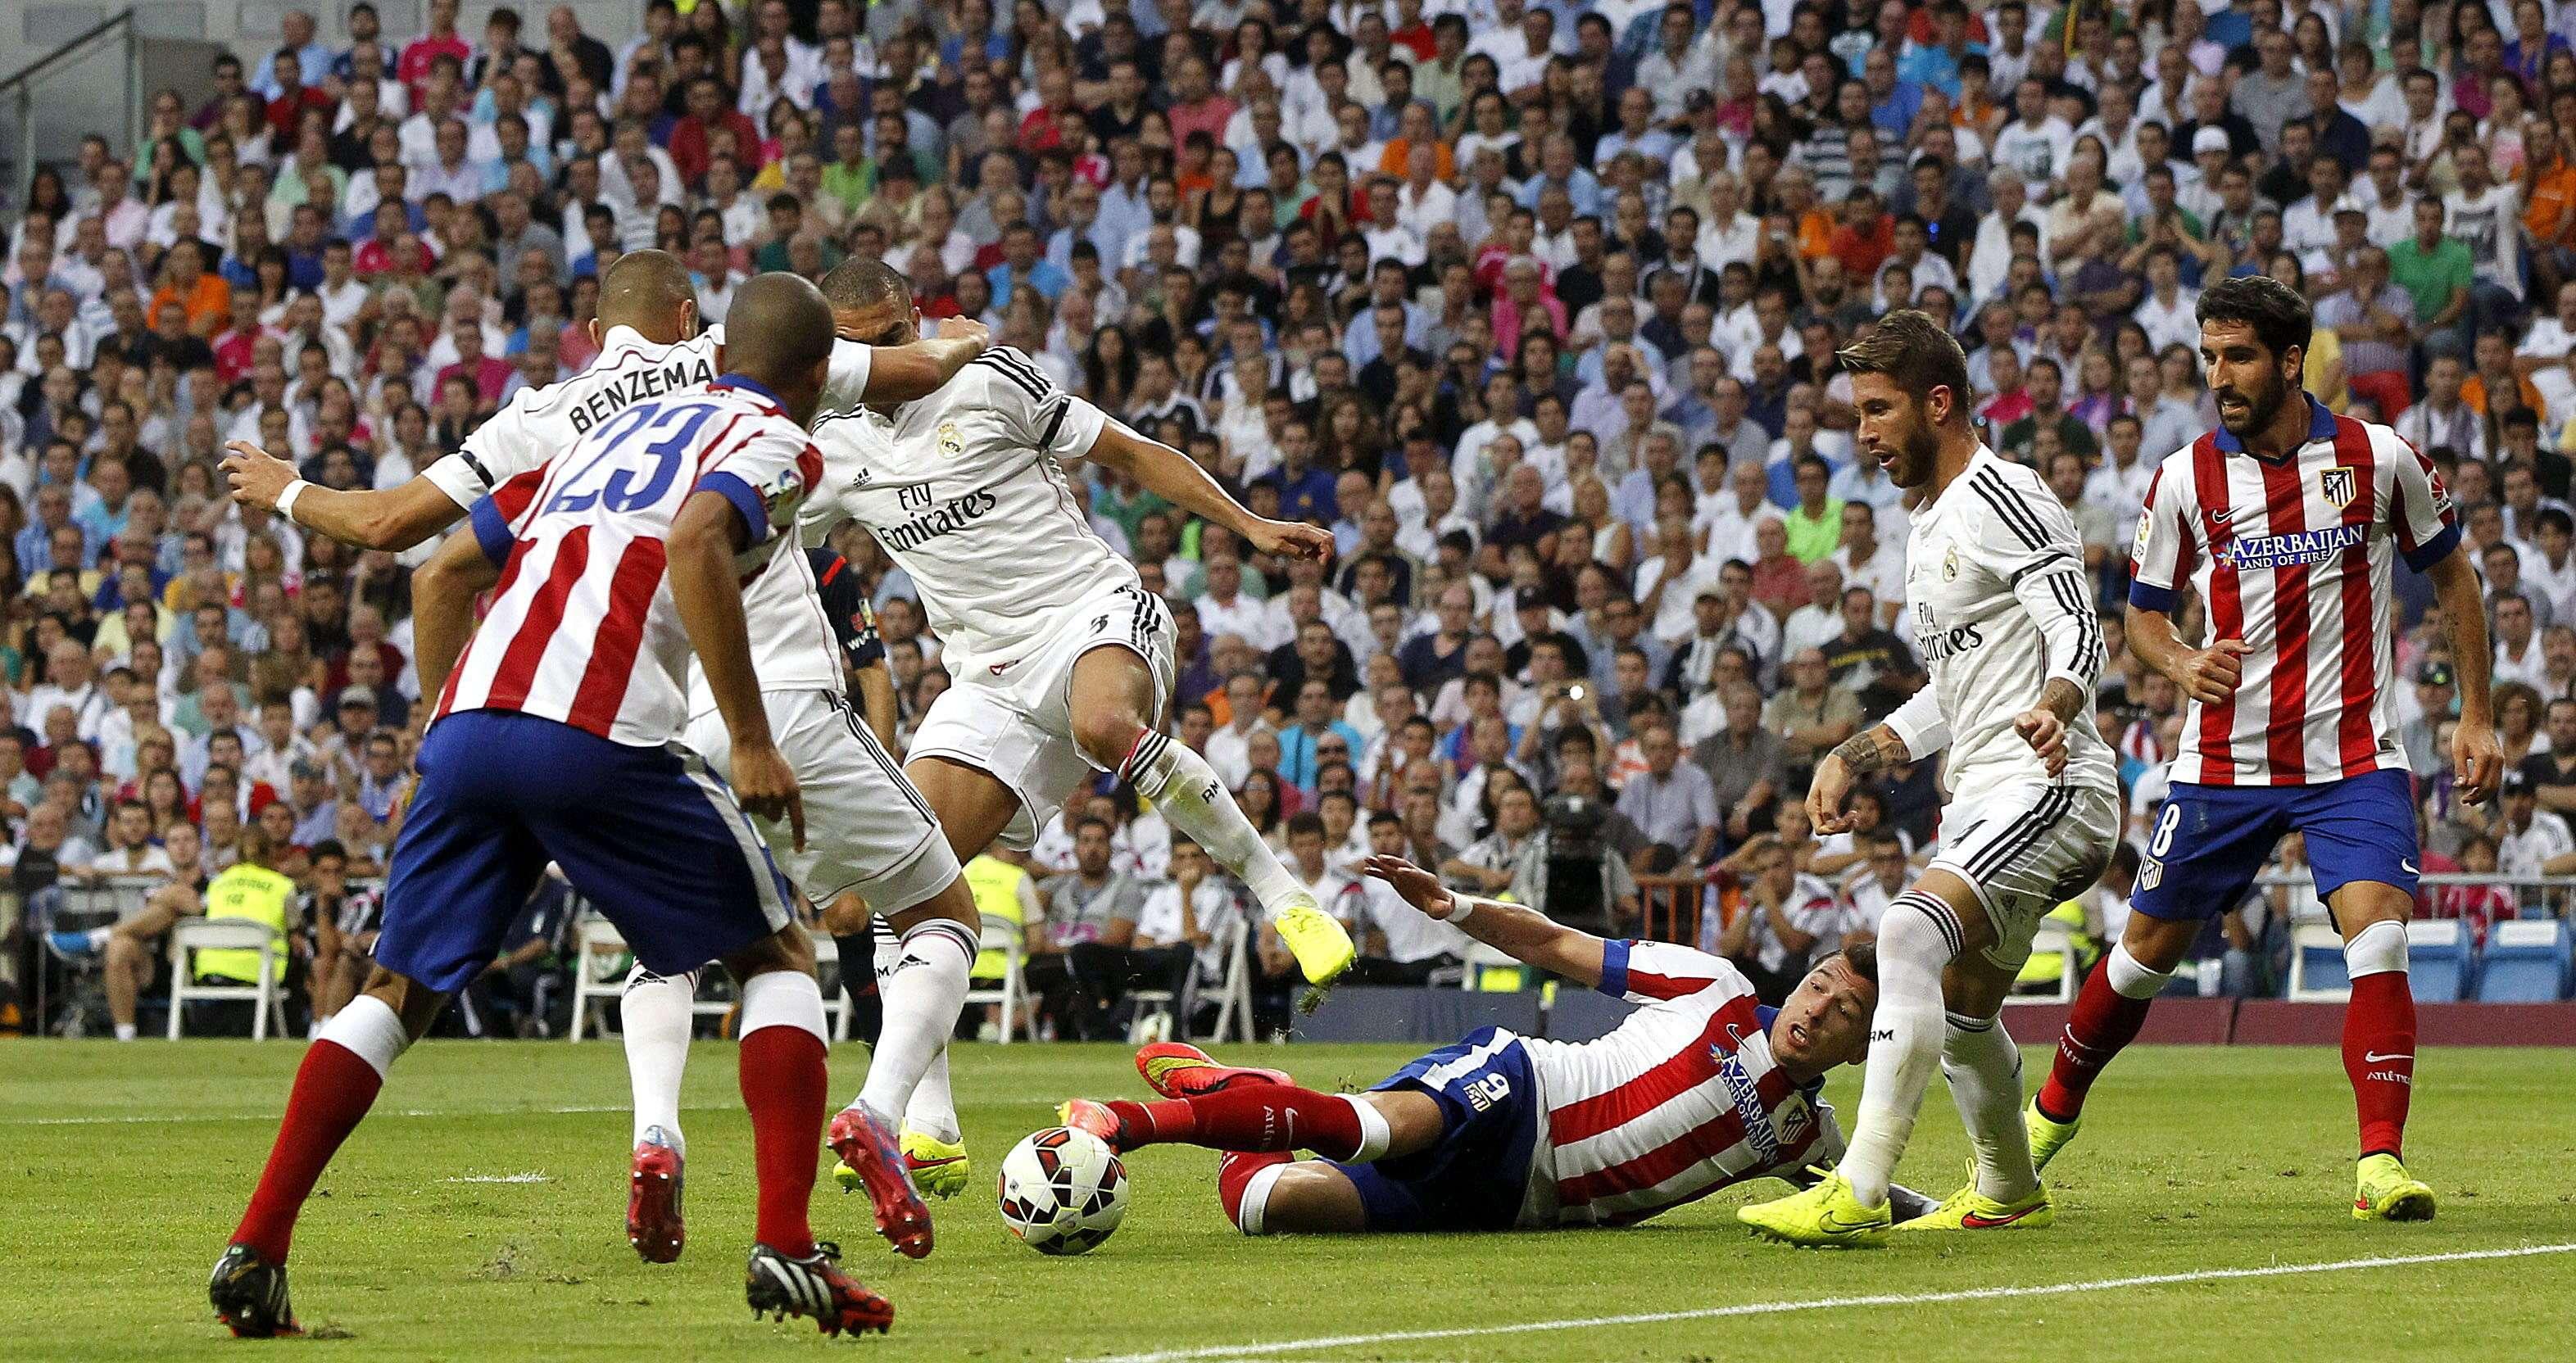 Real Madrid - Atlético de Madrid (Jornada 3). Foto: EFE